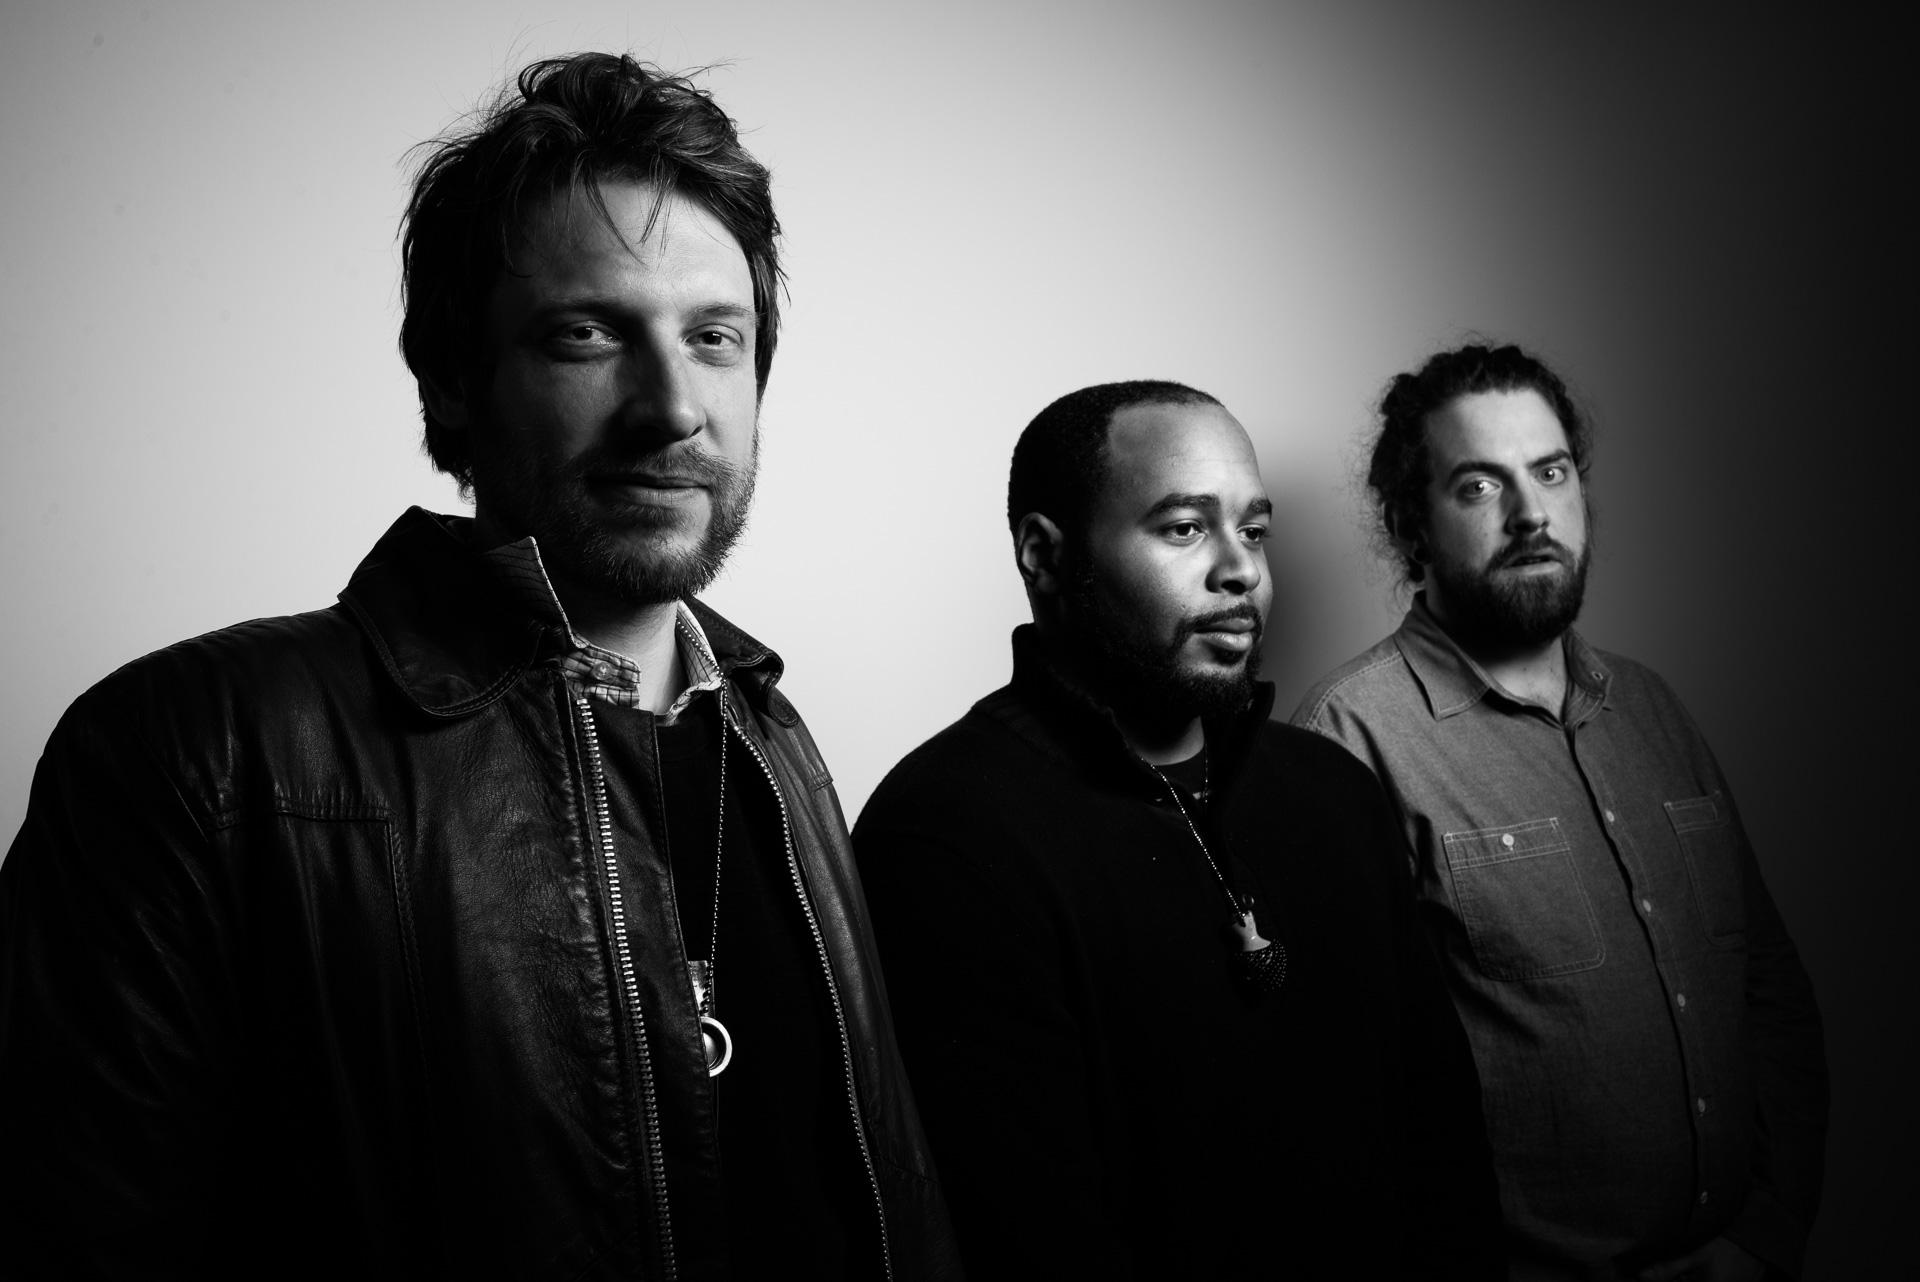 The Jesse Michael Barr Trio